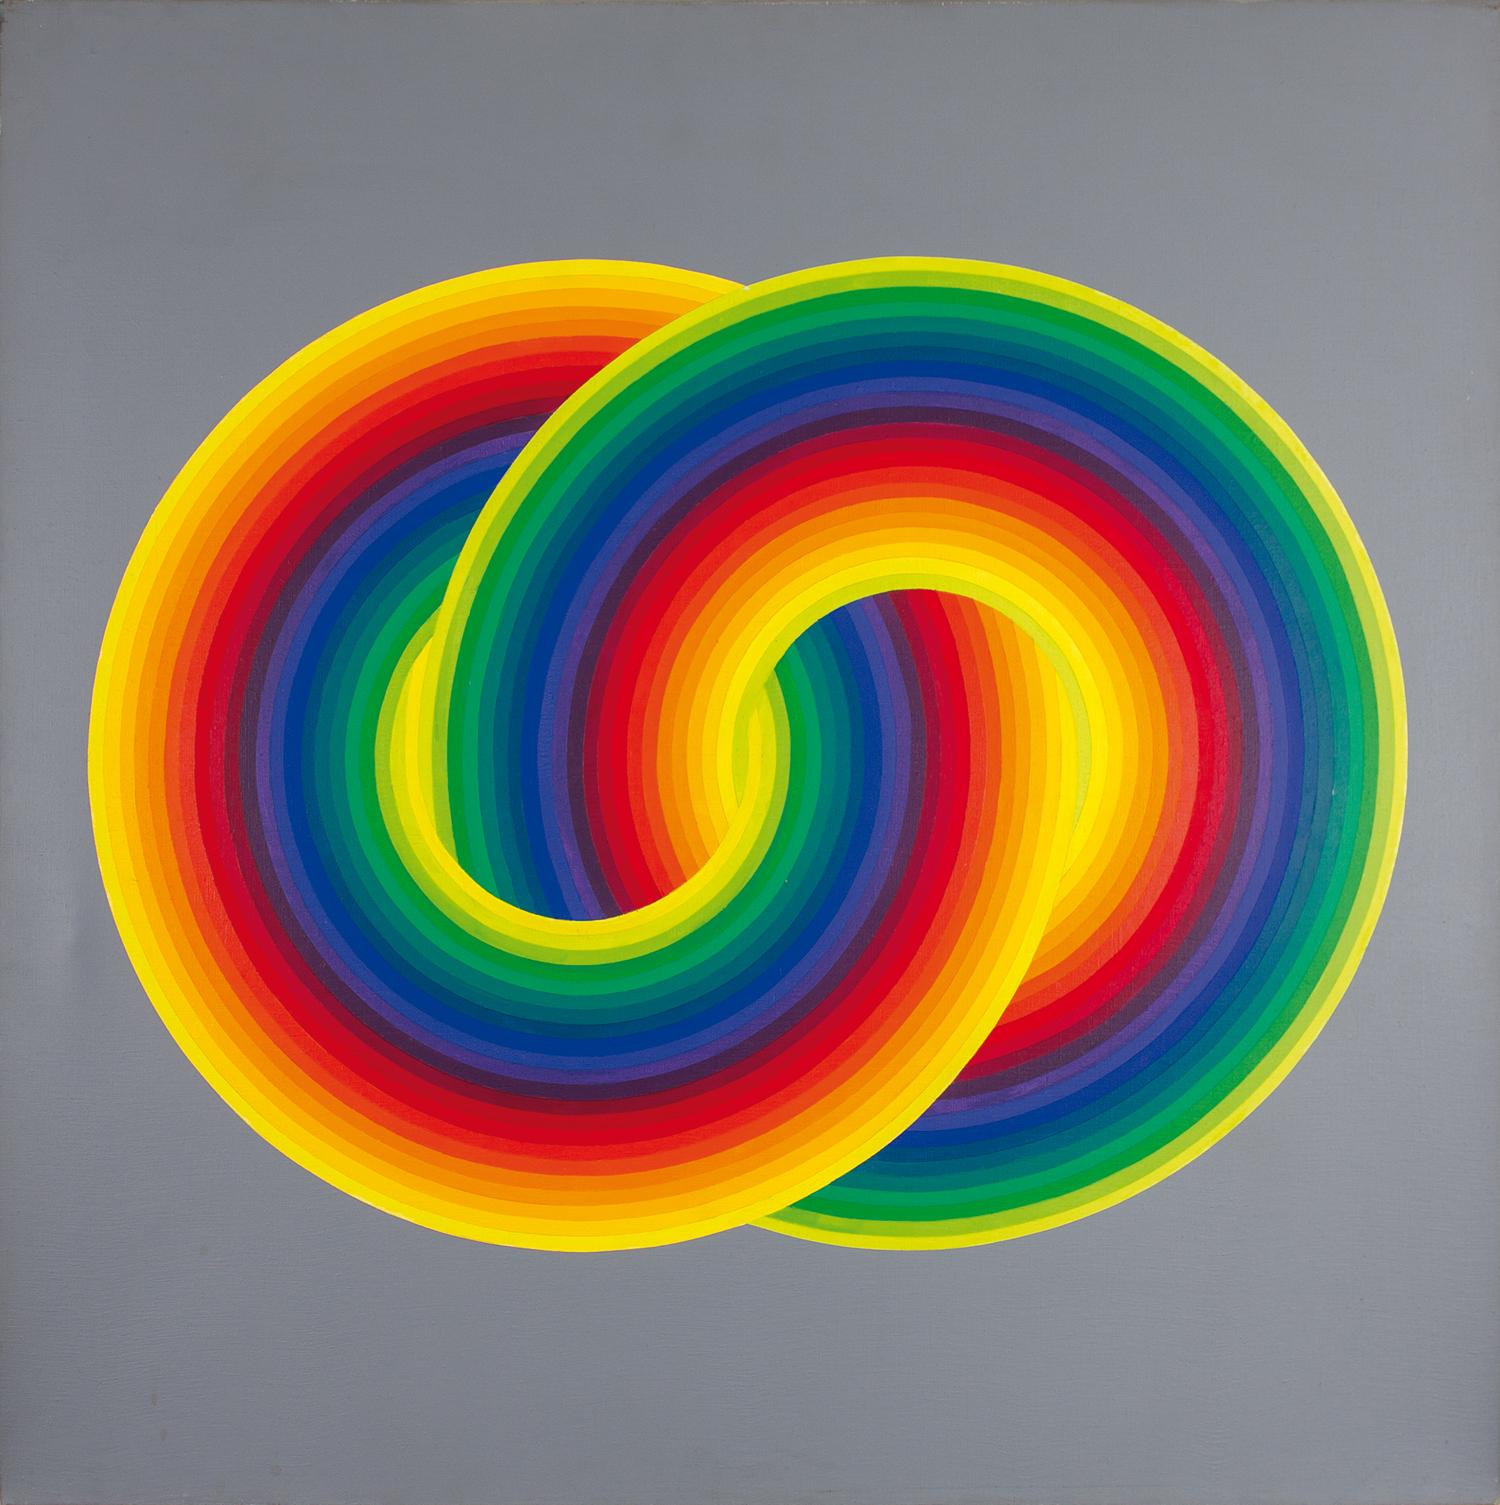 33_Joel Stein 1974 olio su tela 100x100 Due cerchi cromatici